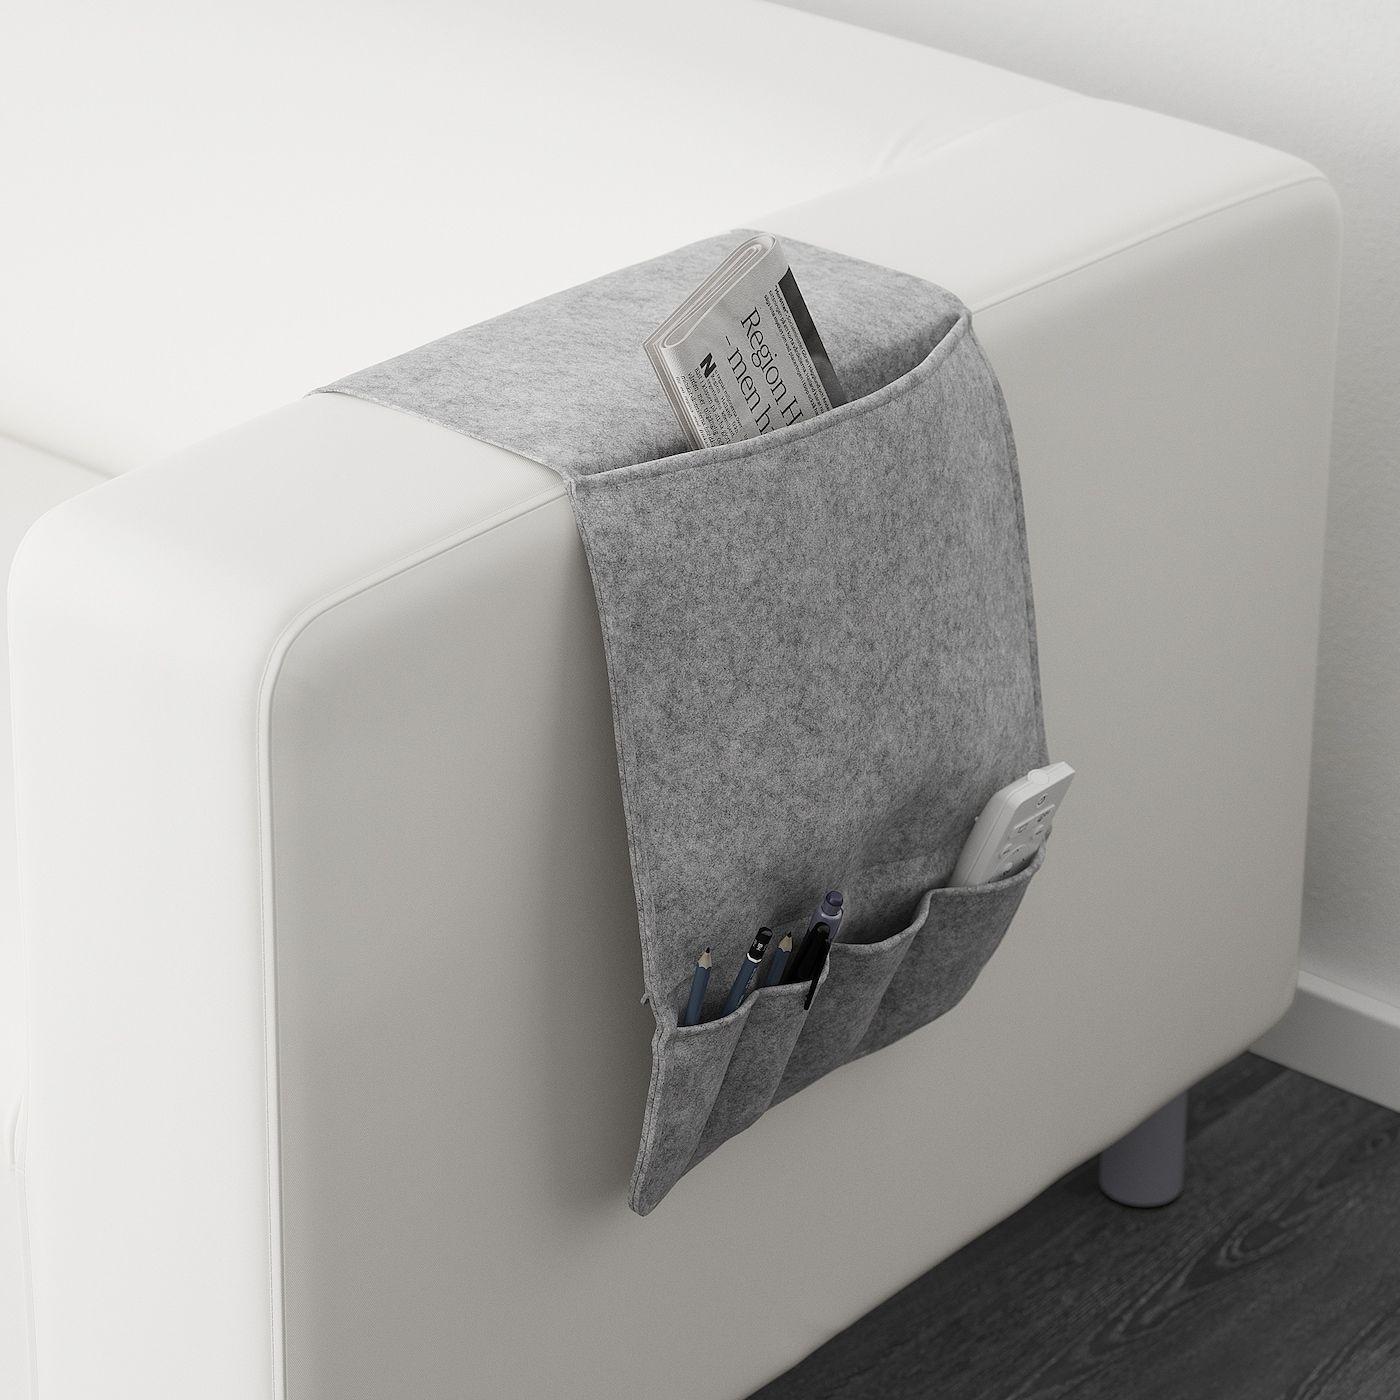 IKEA KNALLBÅGE Hanging organizer for accessories